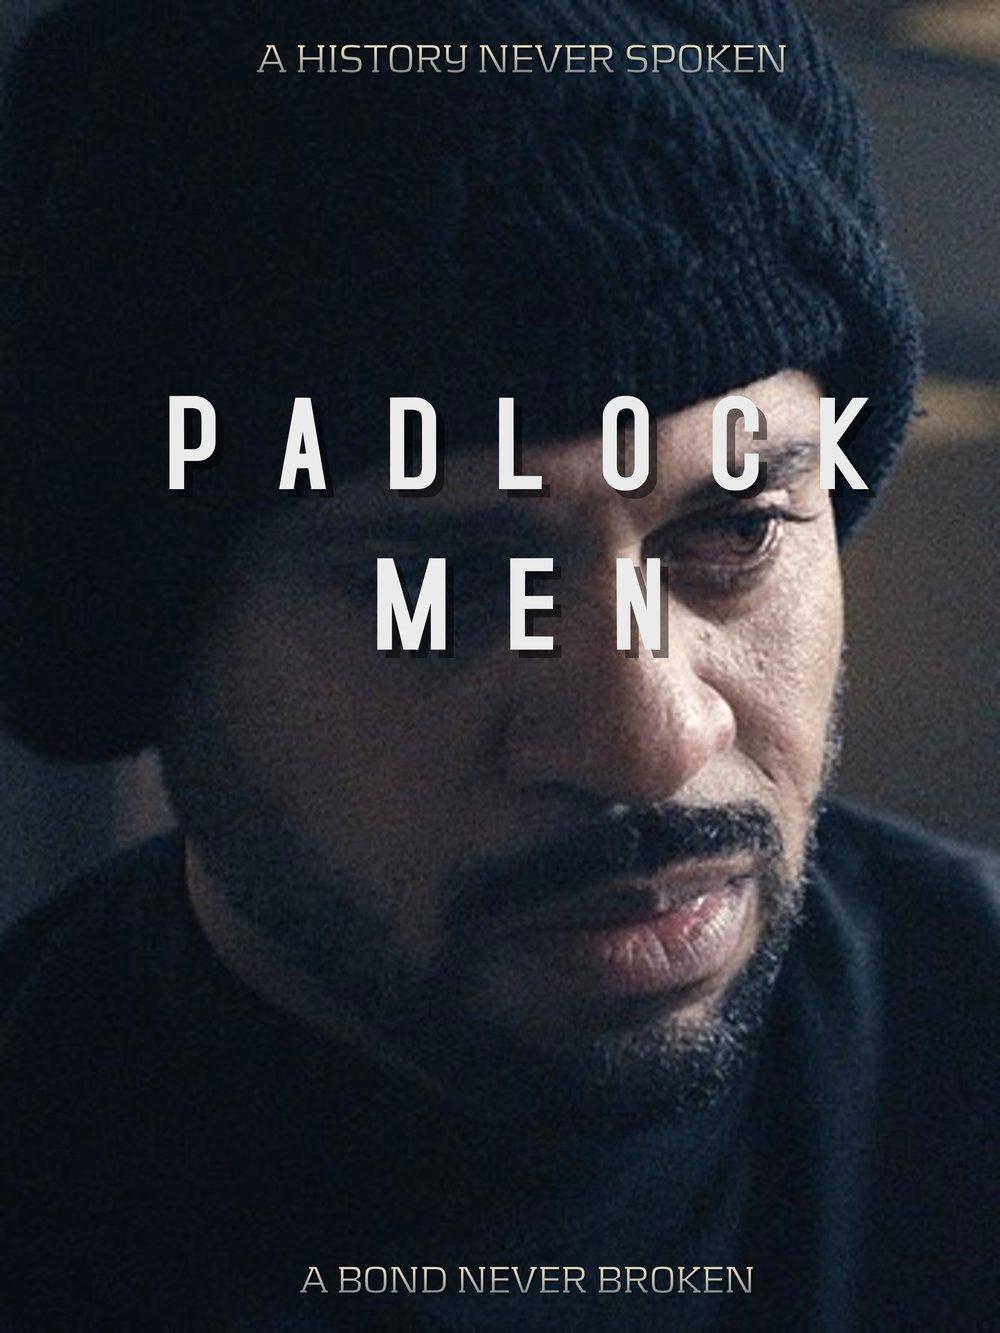 Lewis Powell - Padlock Men Amazon poster_ official key art 1200x1600 (1).jpg